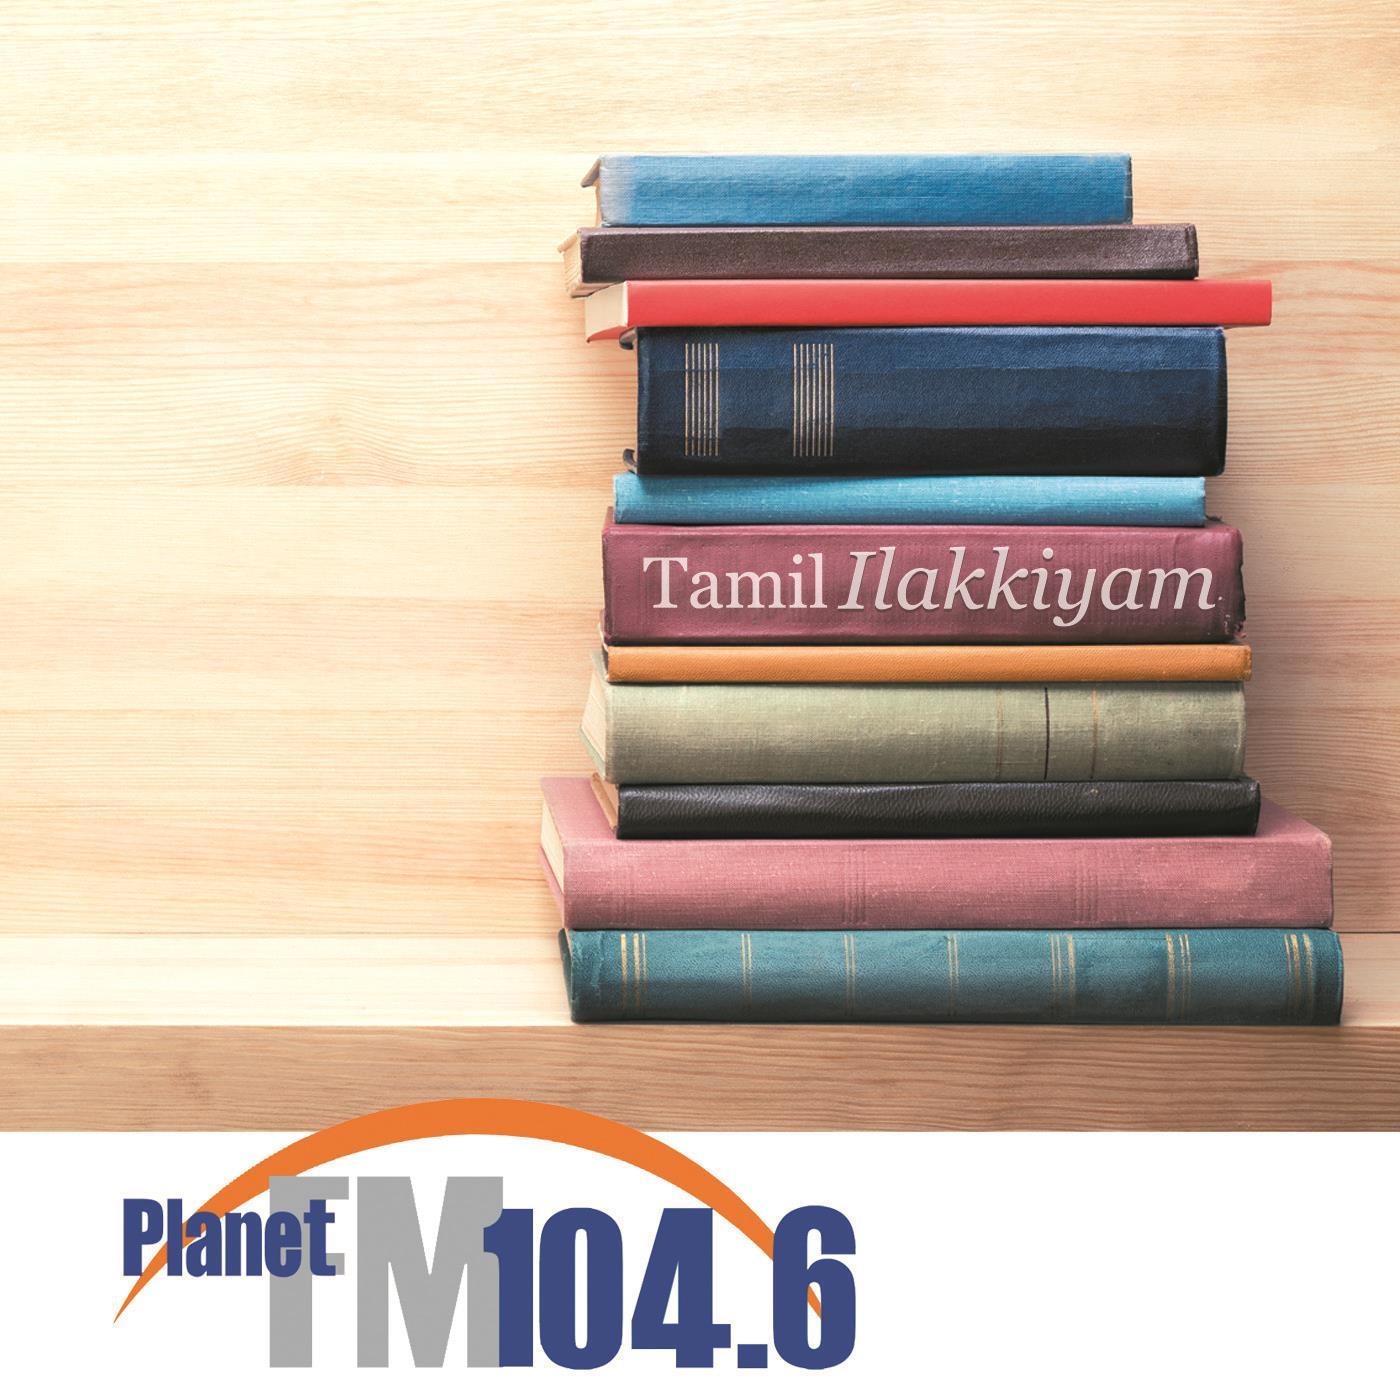 Tamil Ilakkiyam